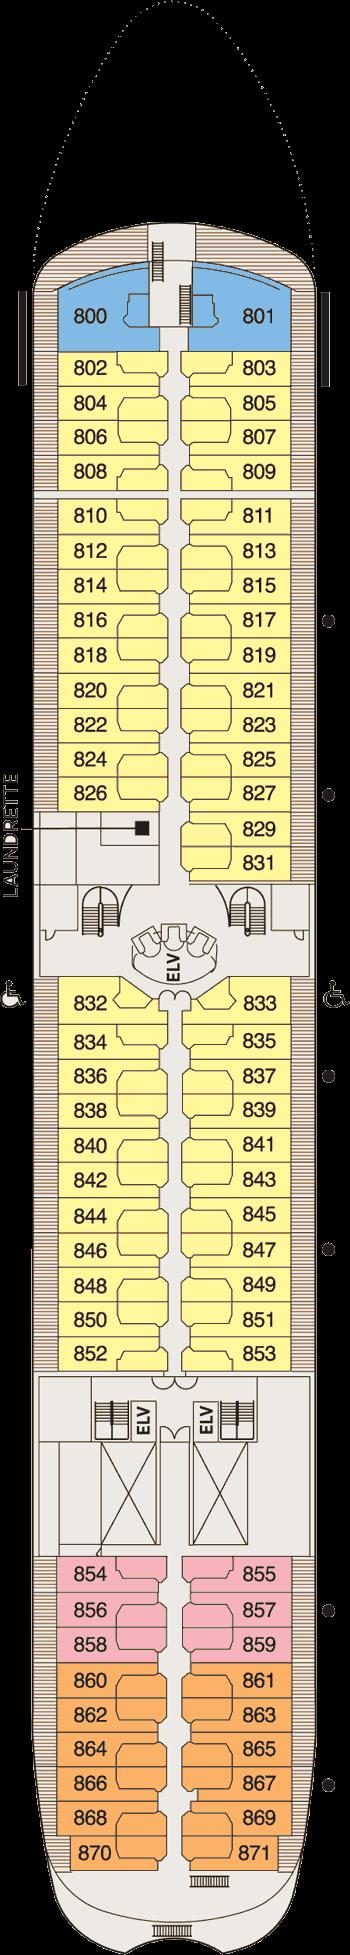 Seven Seas Navigator - Deck 8